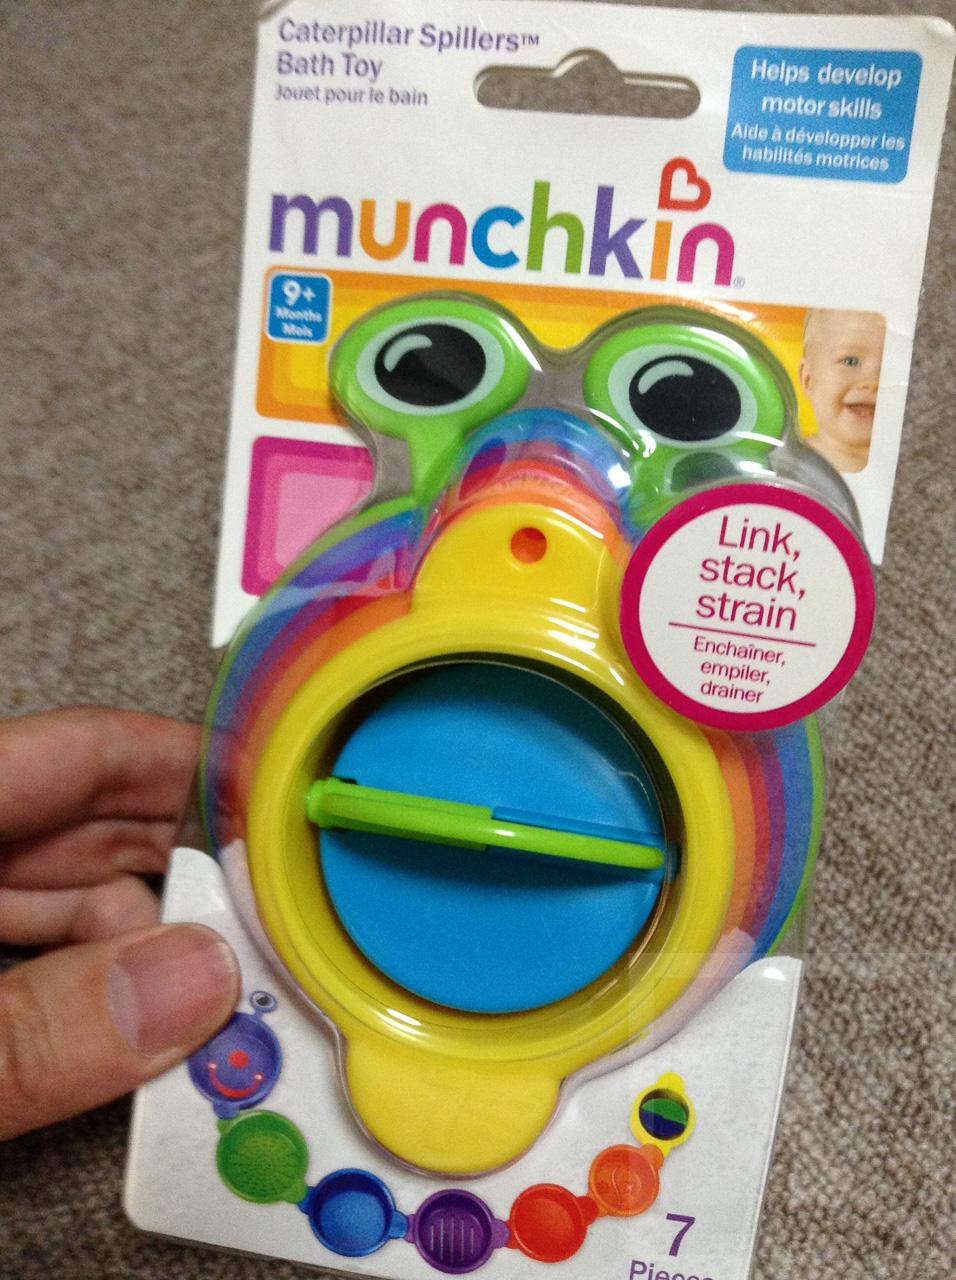 MUNCHKIN(マンチキン) キャタピラー スピラー Review 001